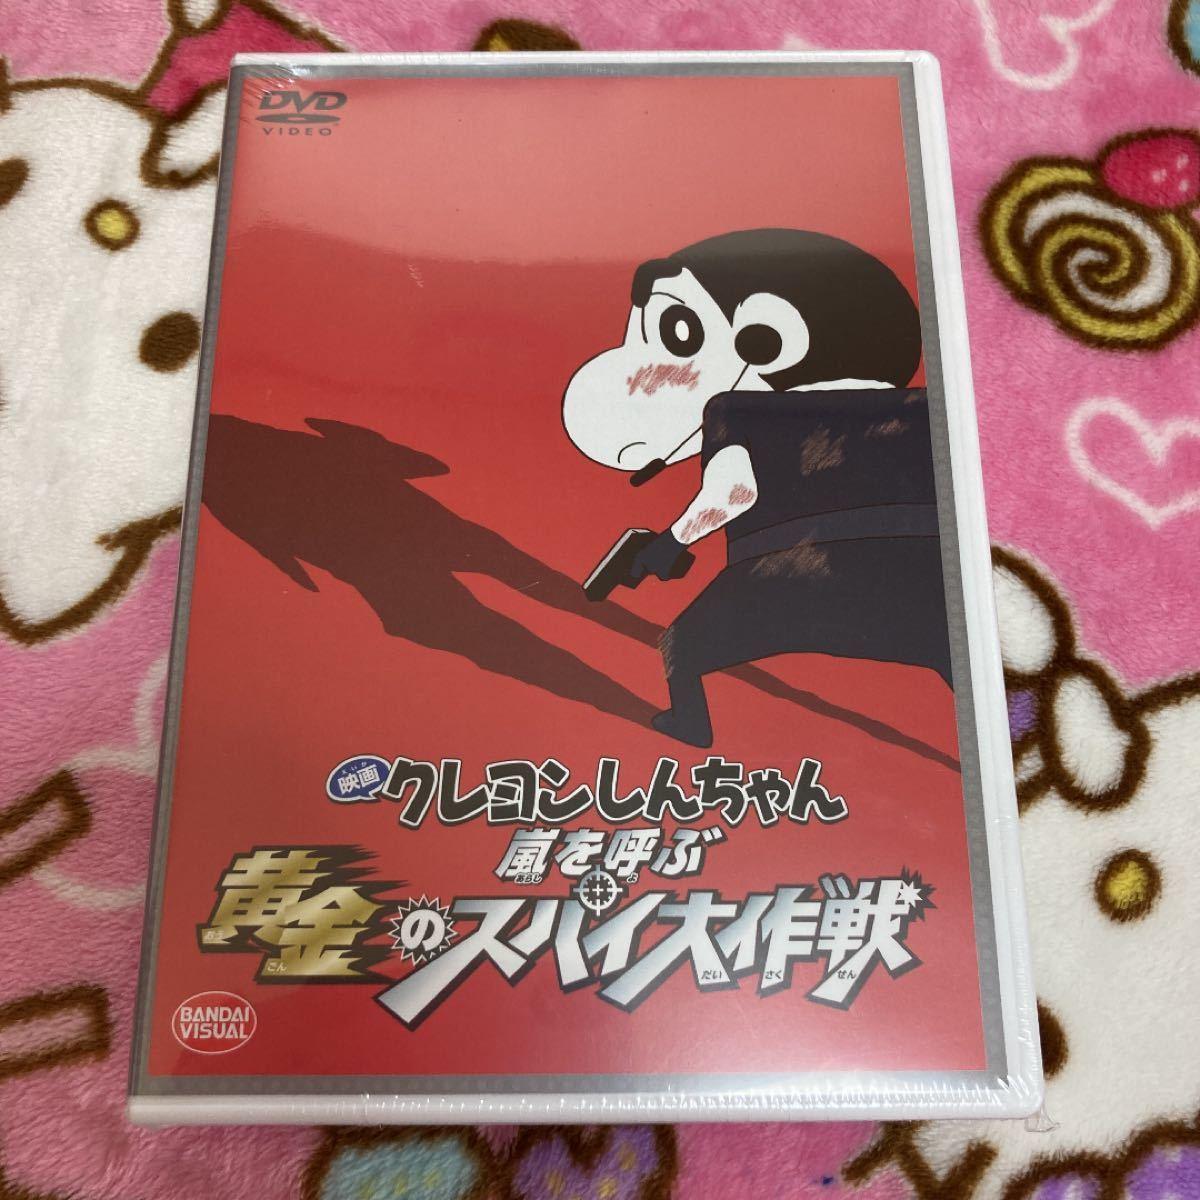 【DVD】 映画 クレヨンしんちゃん 嵐を呼ぶ黄金のスパイ大作戦